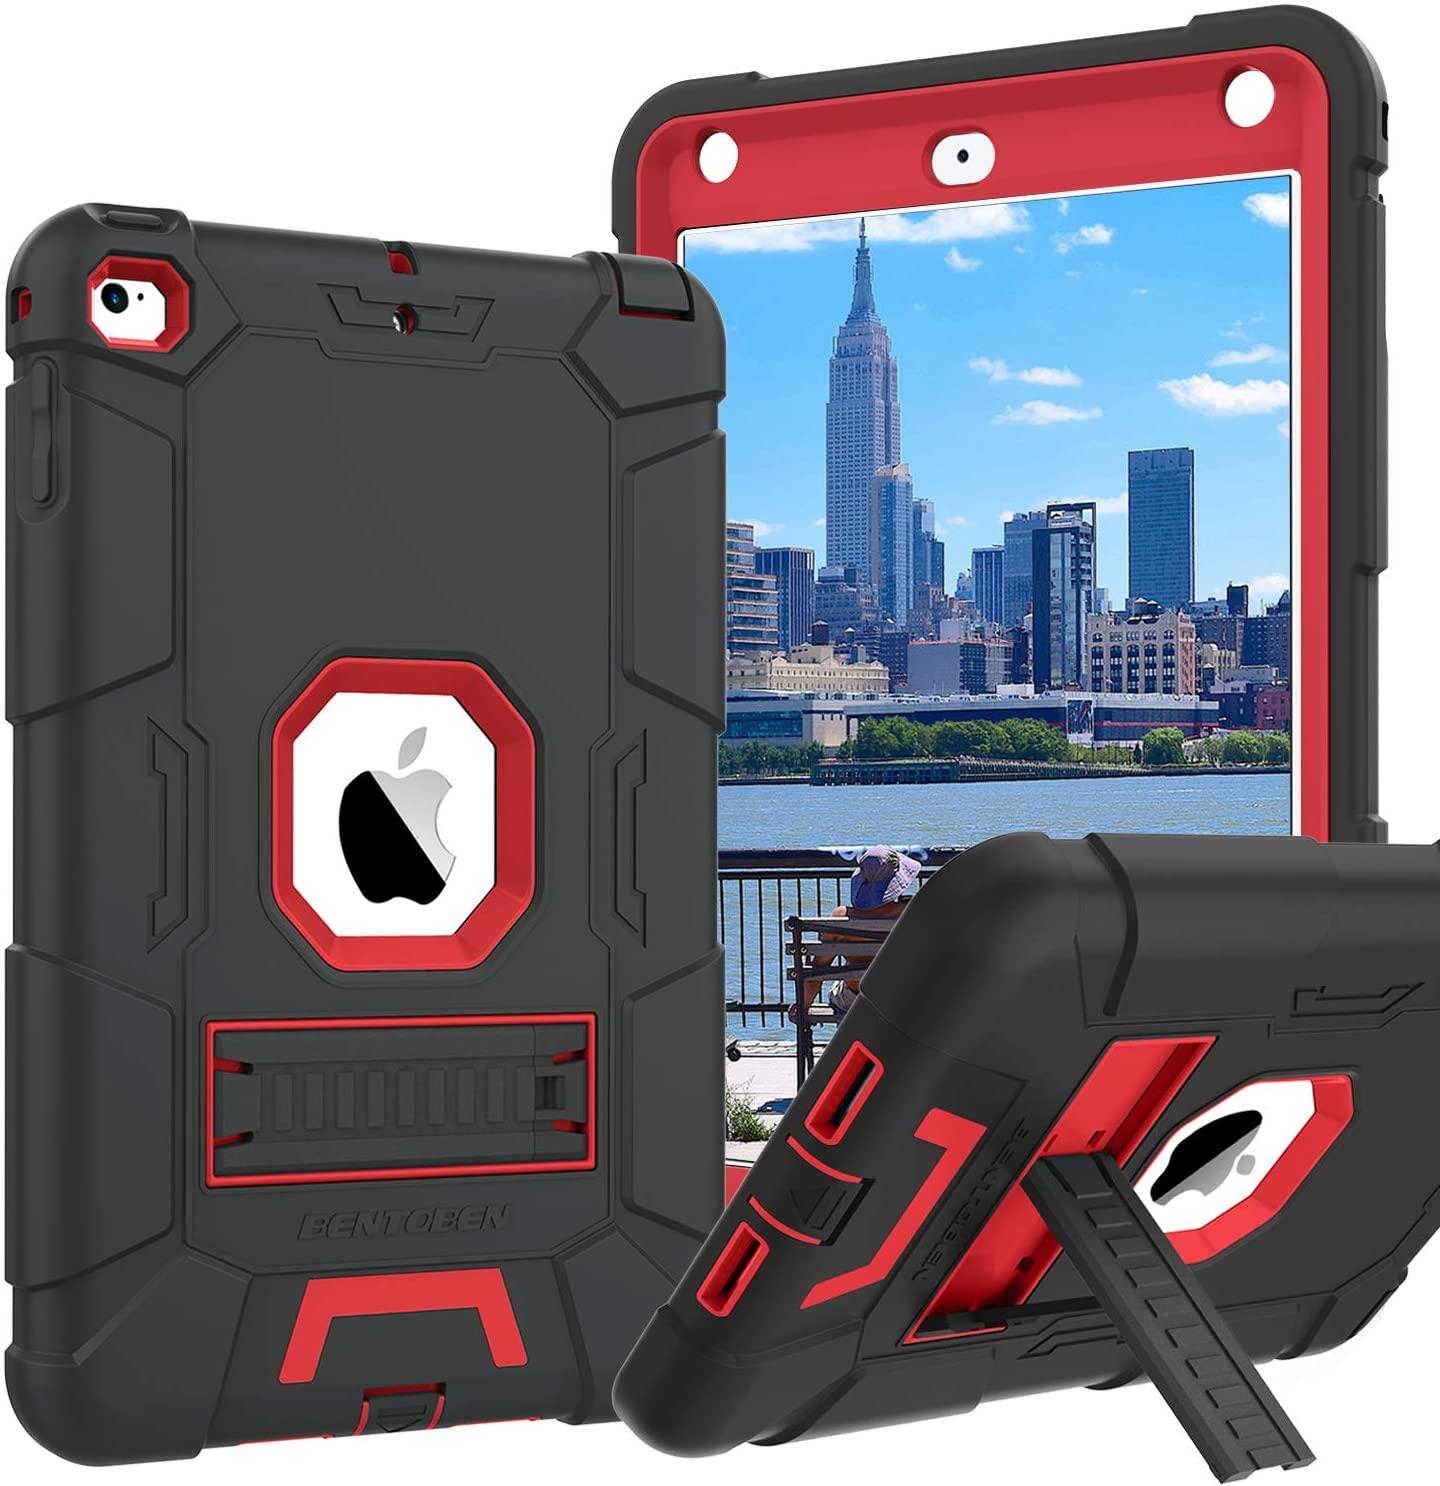 BENTOBEN iPad Mini 5 Case, iPad Mini 4 Case, Kickstand Hybrid Three Layer Heavy Duty Rugged High Impact Resistant Cover Shockproof Protective Cases for iPad Mini 5/ Mini 4,Black/Red